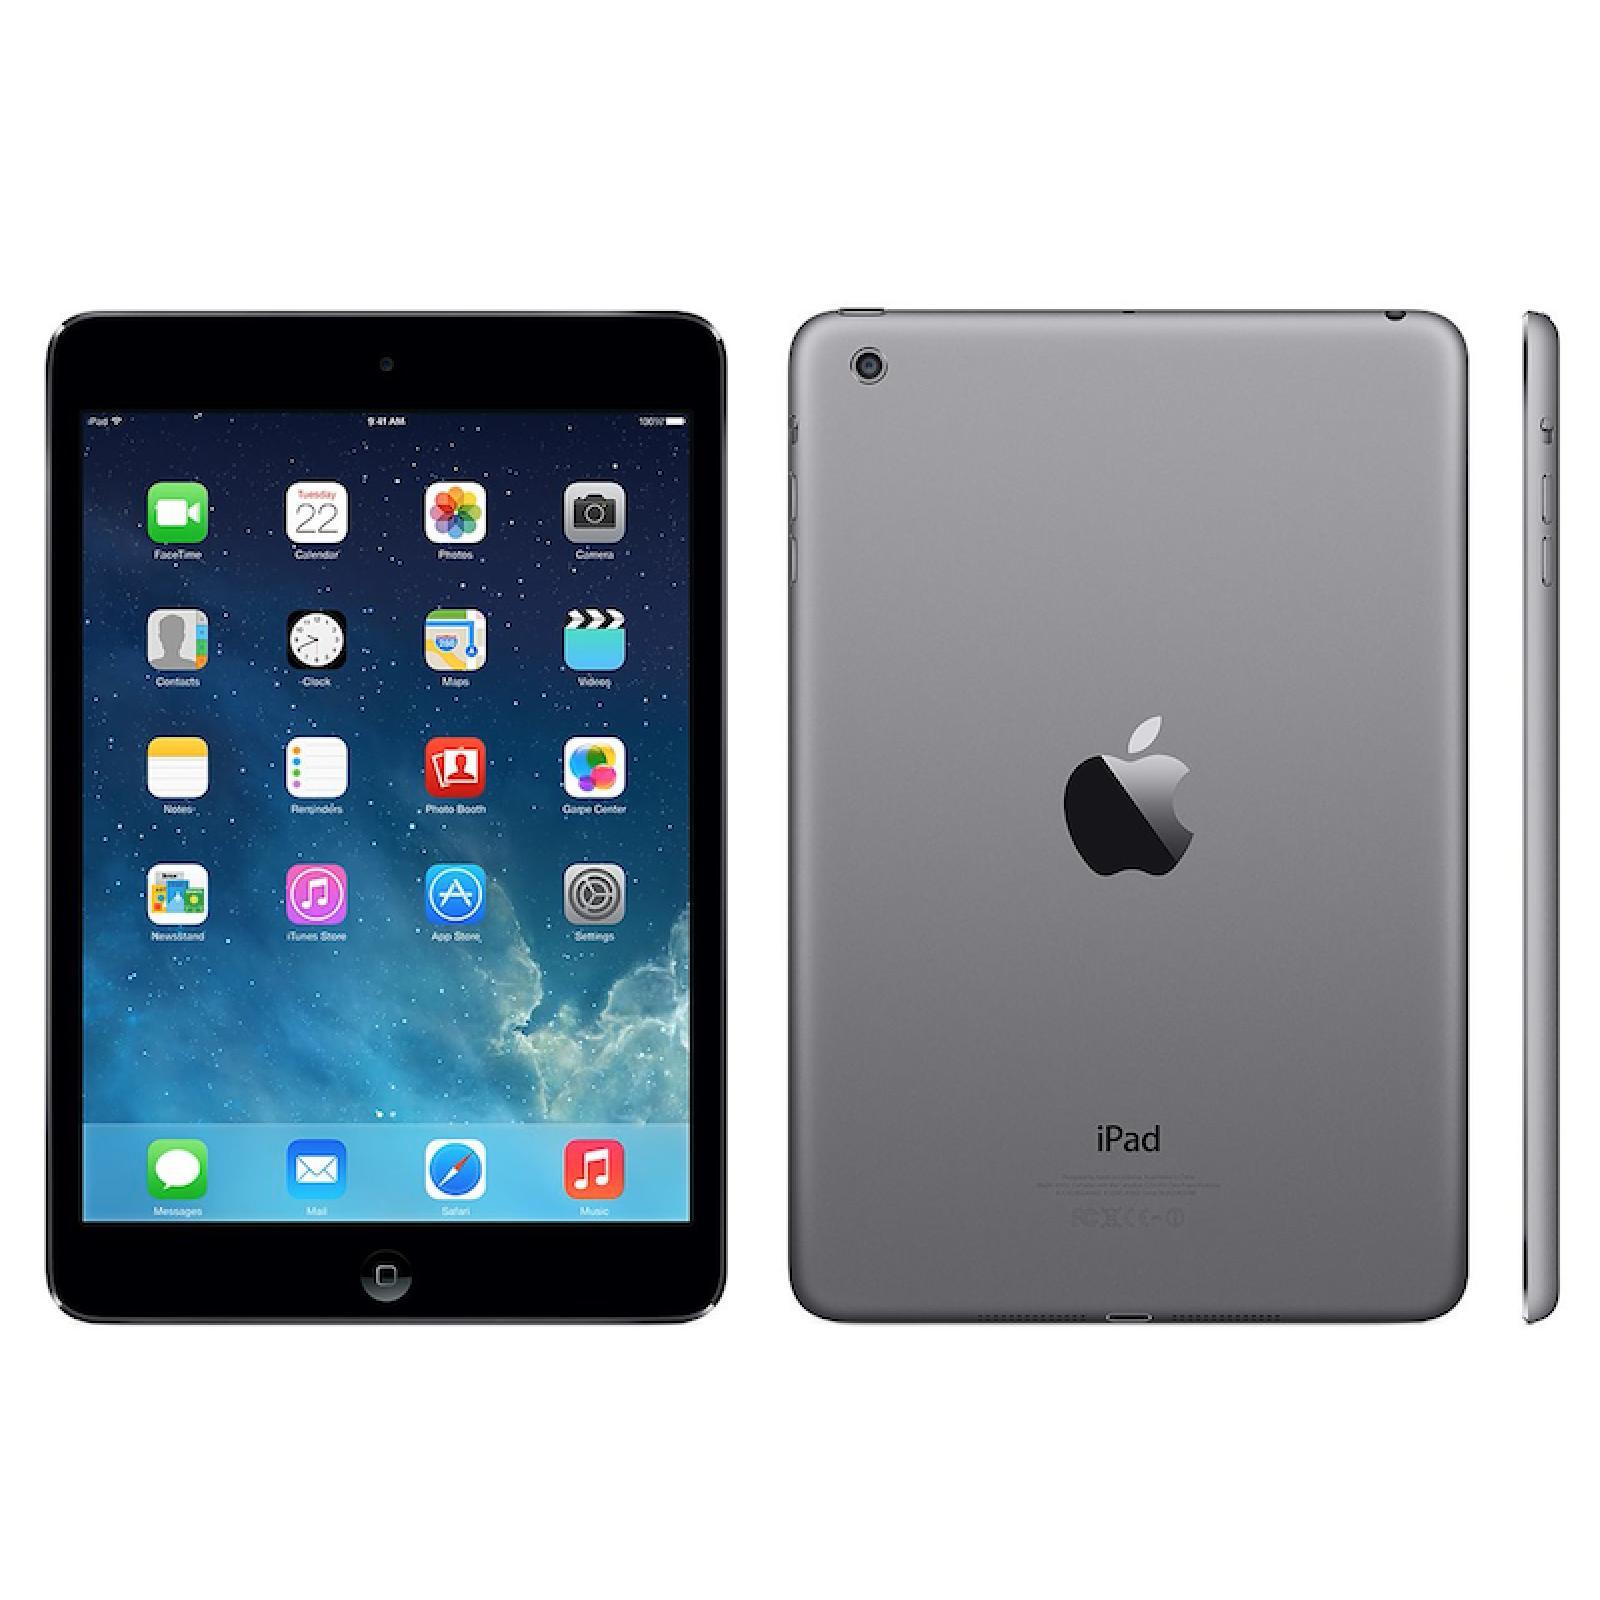 iPad mini 2 7.9'' 16 Go - Wifi - Gris sidéral